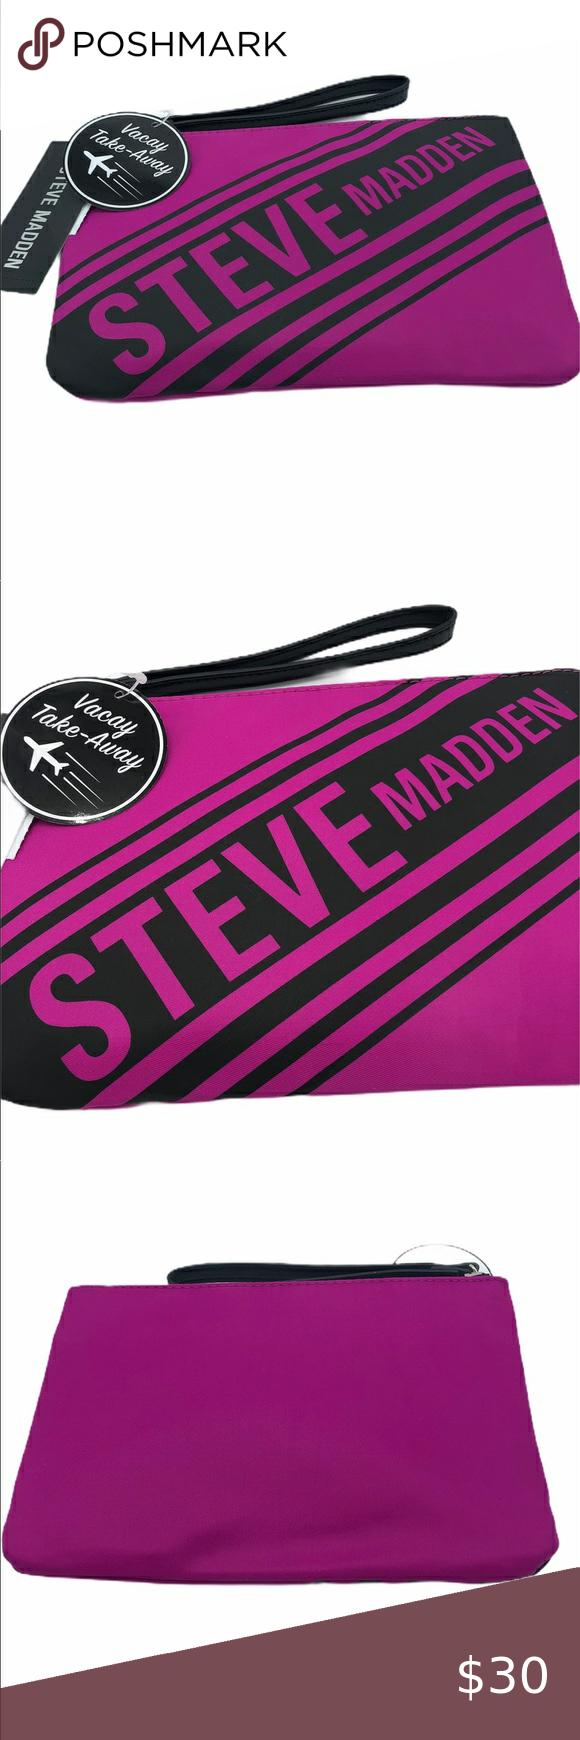 Steve Madden Handbag Wristlet Steve Madden Color Neon Pink Logo Flat Pouch 6 1 2 X 9 Steve Madden Bags Cosmeti Steve Madden Handbags Handbag Steve Madden